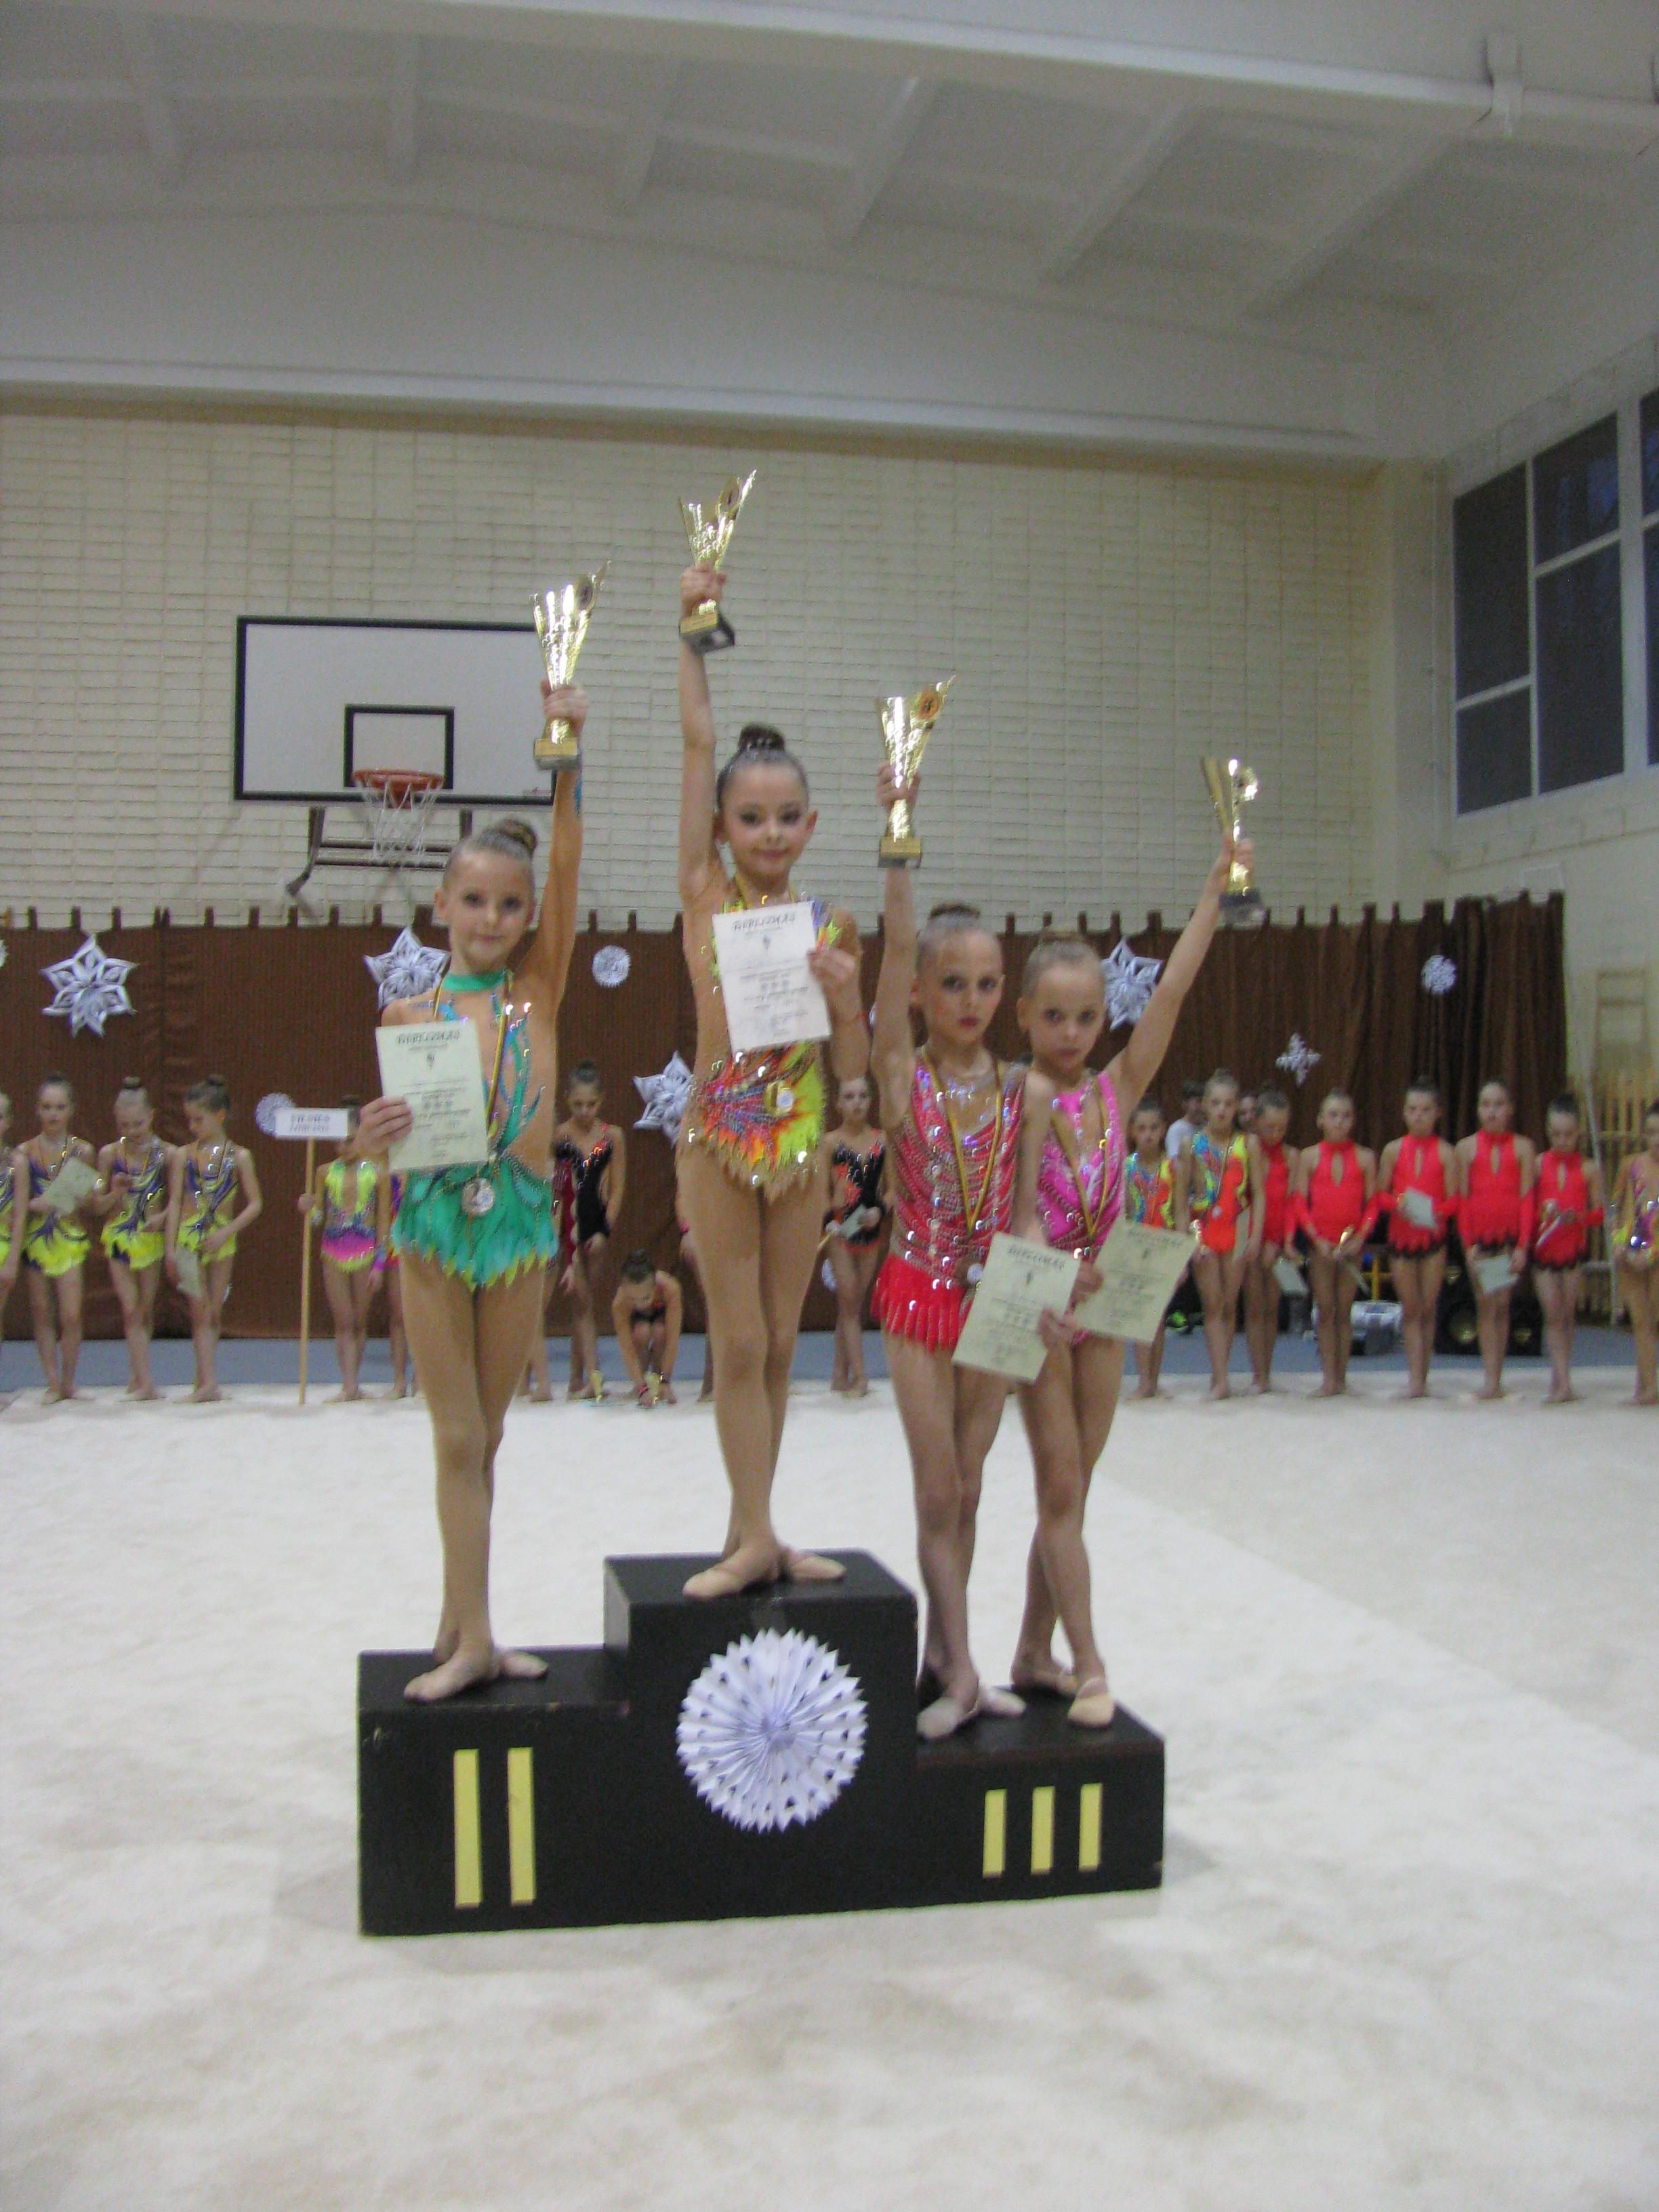 2008m.g. U. Madzajūtė - 1v., S. Razokaitė-2v.